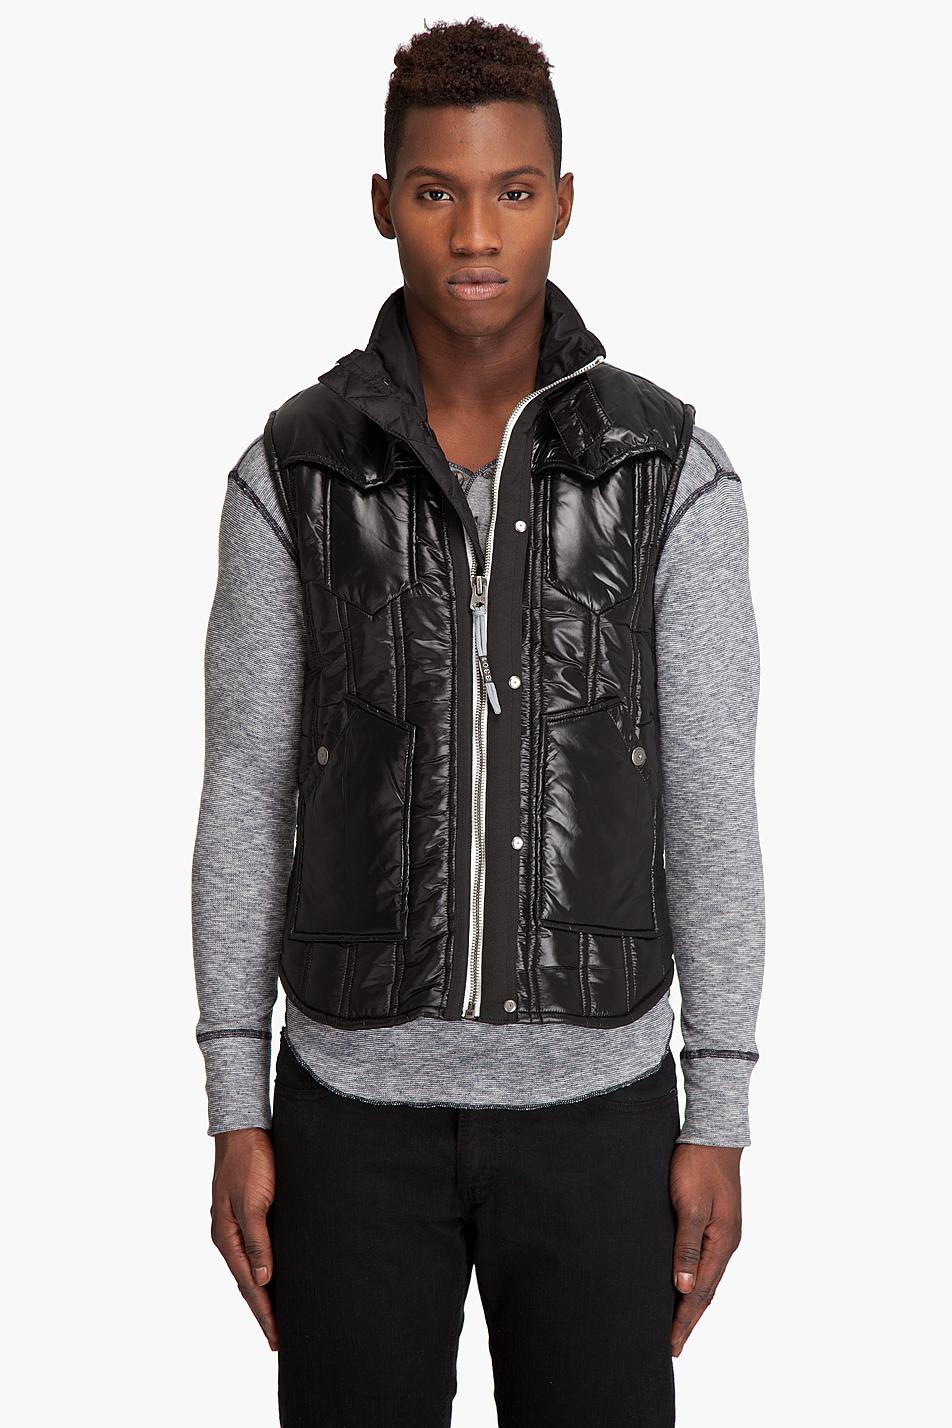 lyst g star raw new colorado quilted vest in black for men. Black Bedroom Furniture Sets. Home Design Ideas